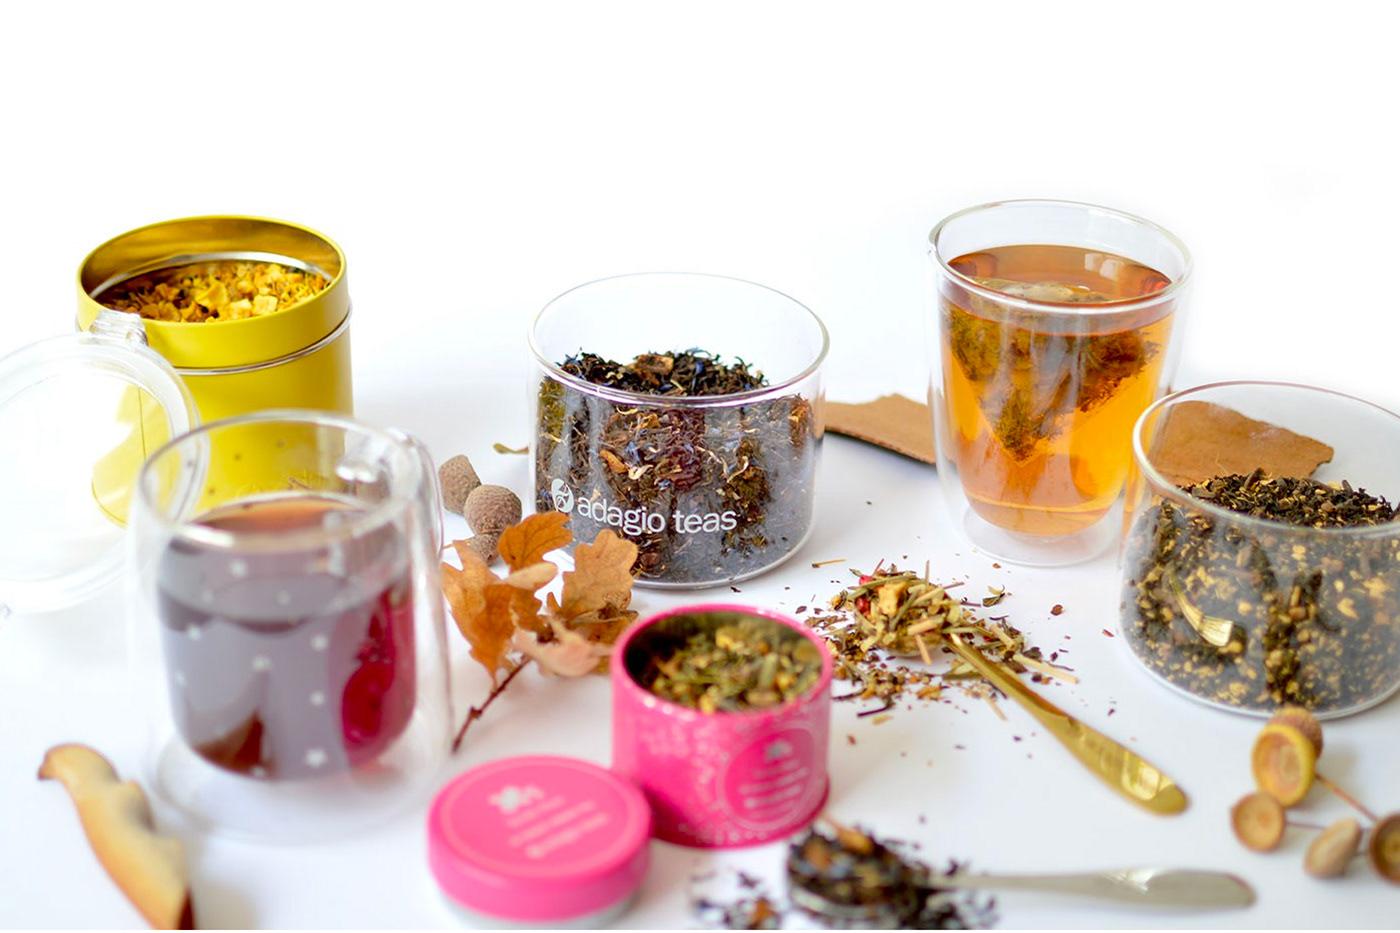 around discover drink Food  neighborhood Shopping taste tea teas usa